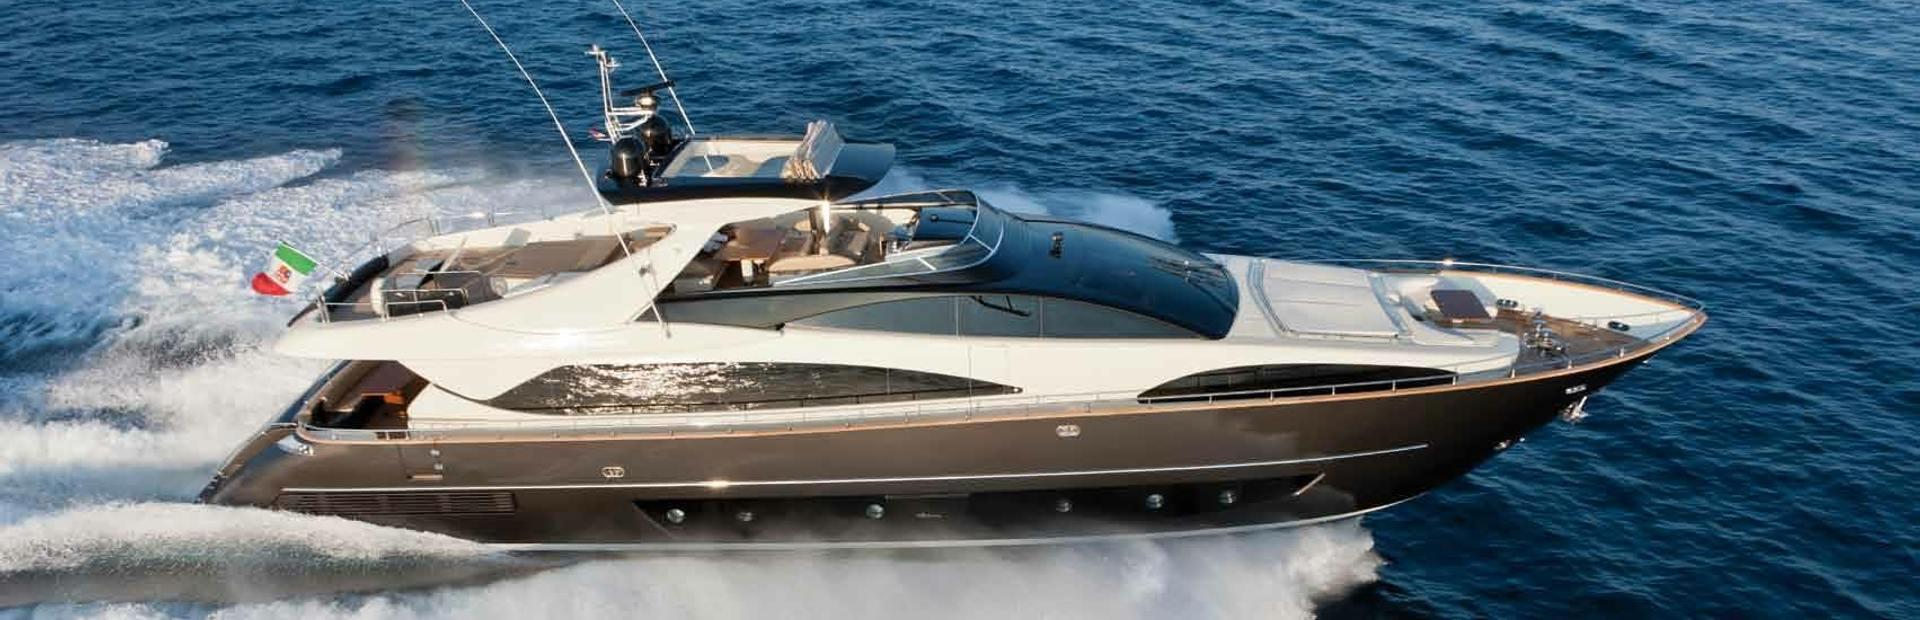 92' Duchessa Yacht Charter